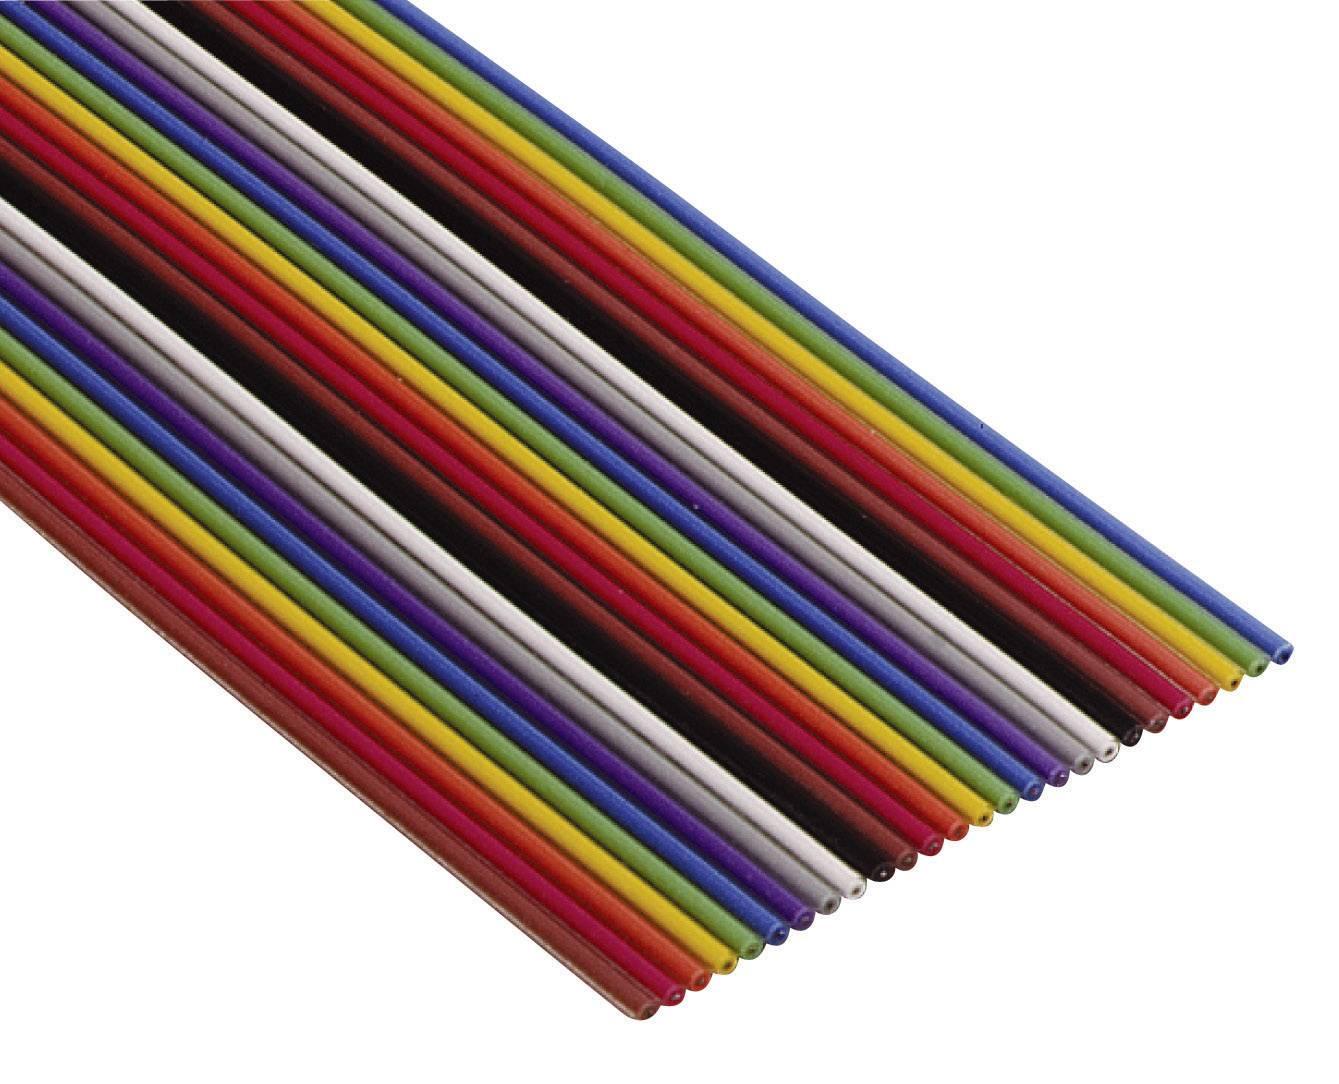 Plochý kabel 3M 3M-3302-20 SF (80610377329), nestíněný, 1 m